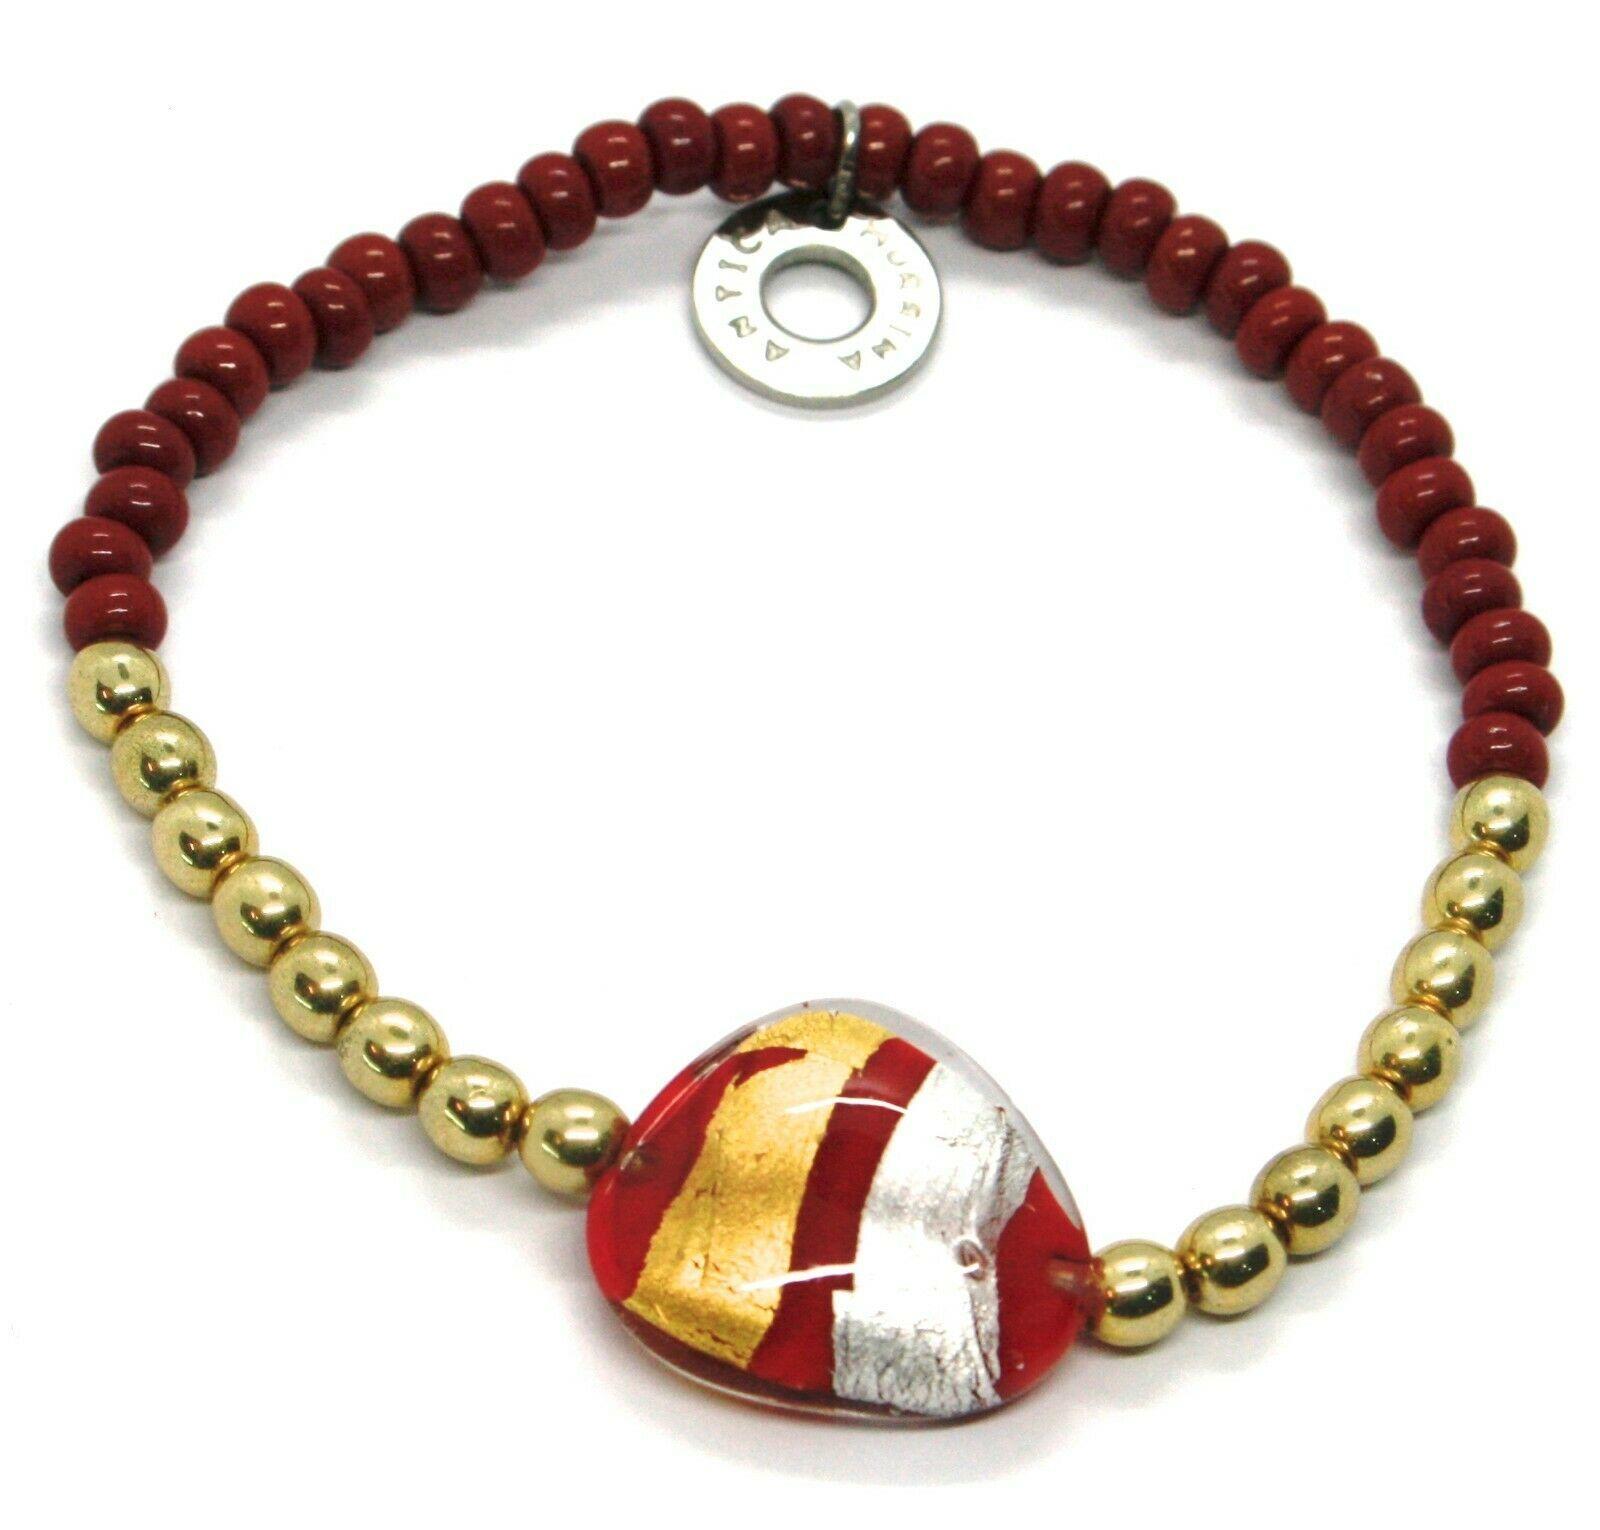 Bracelet Antica Murrina Venezia BR748A11, Moretta, Drop Red, Elastic